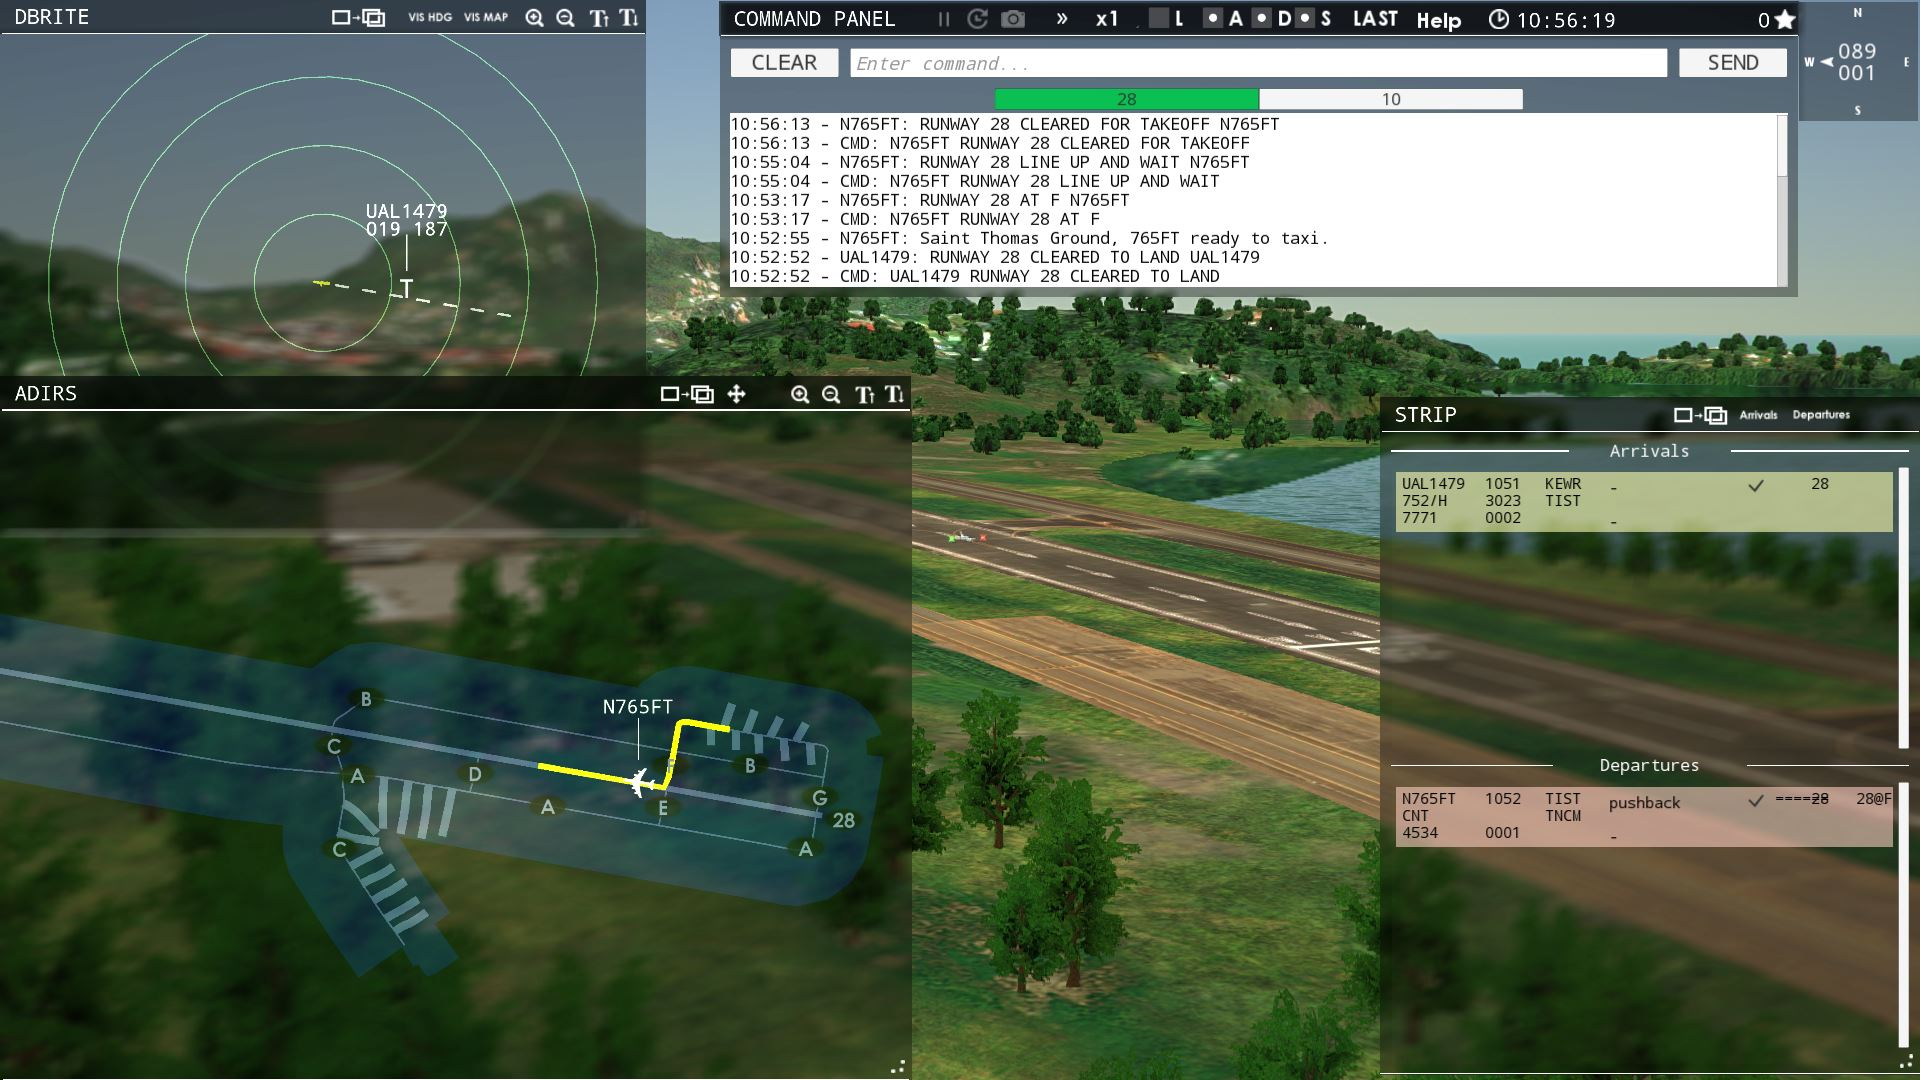 Tower! 3D Pro, Intersection Takeoff - ATC Simulators - The